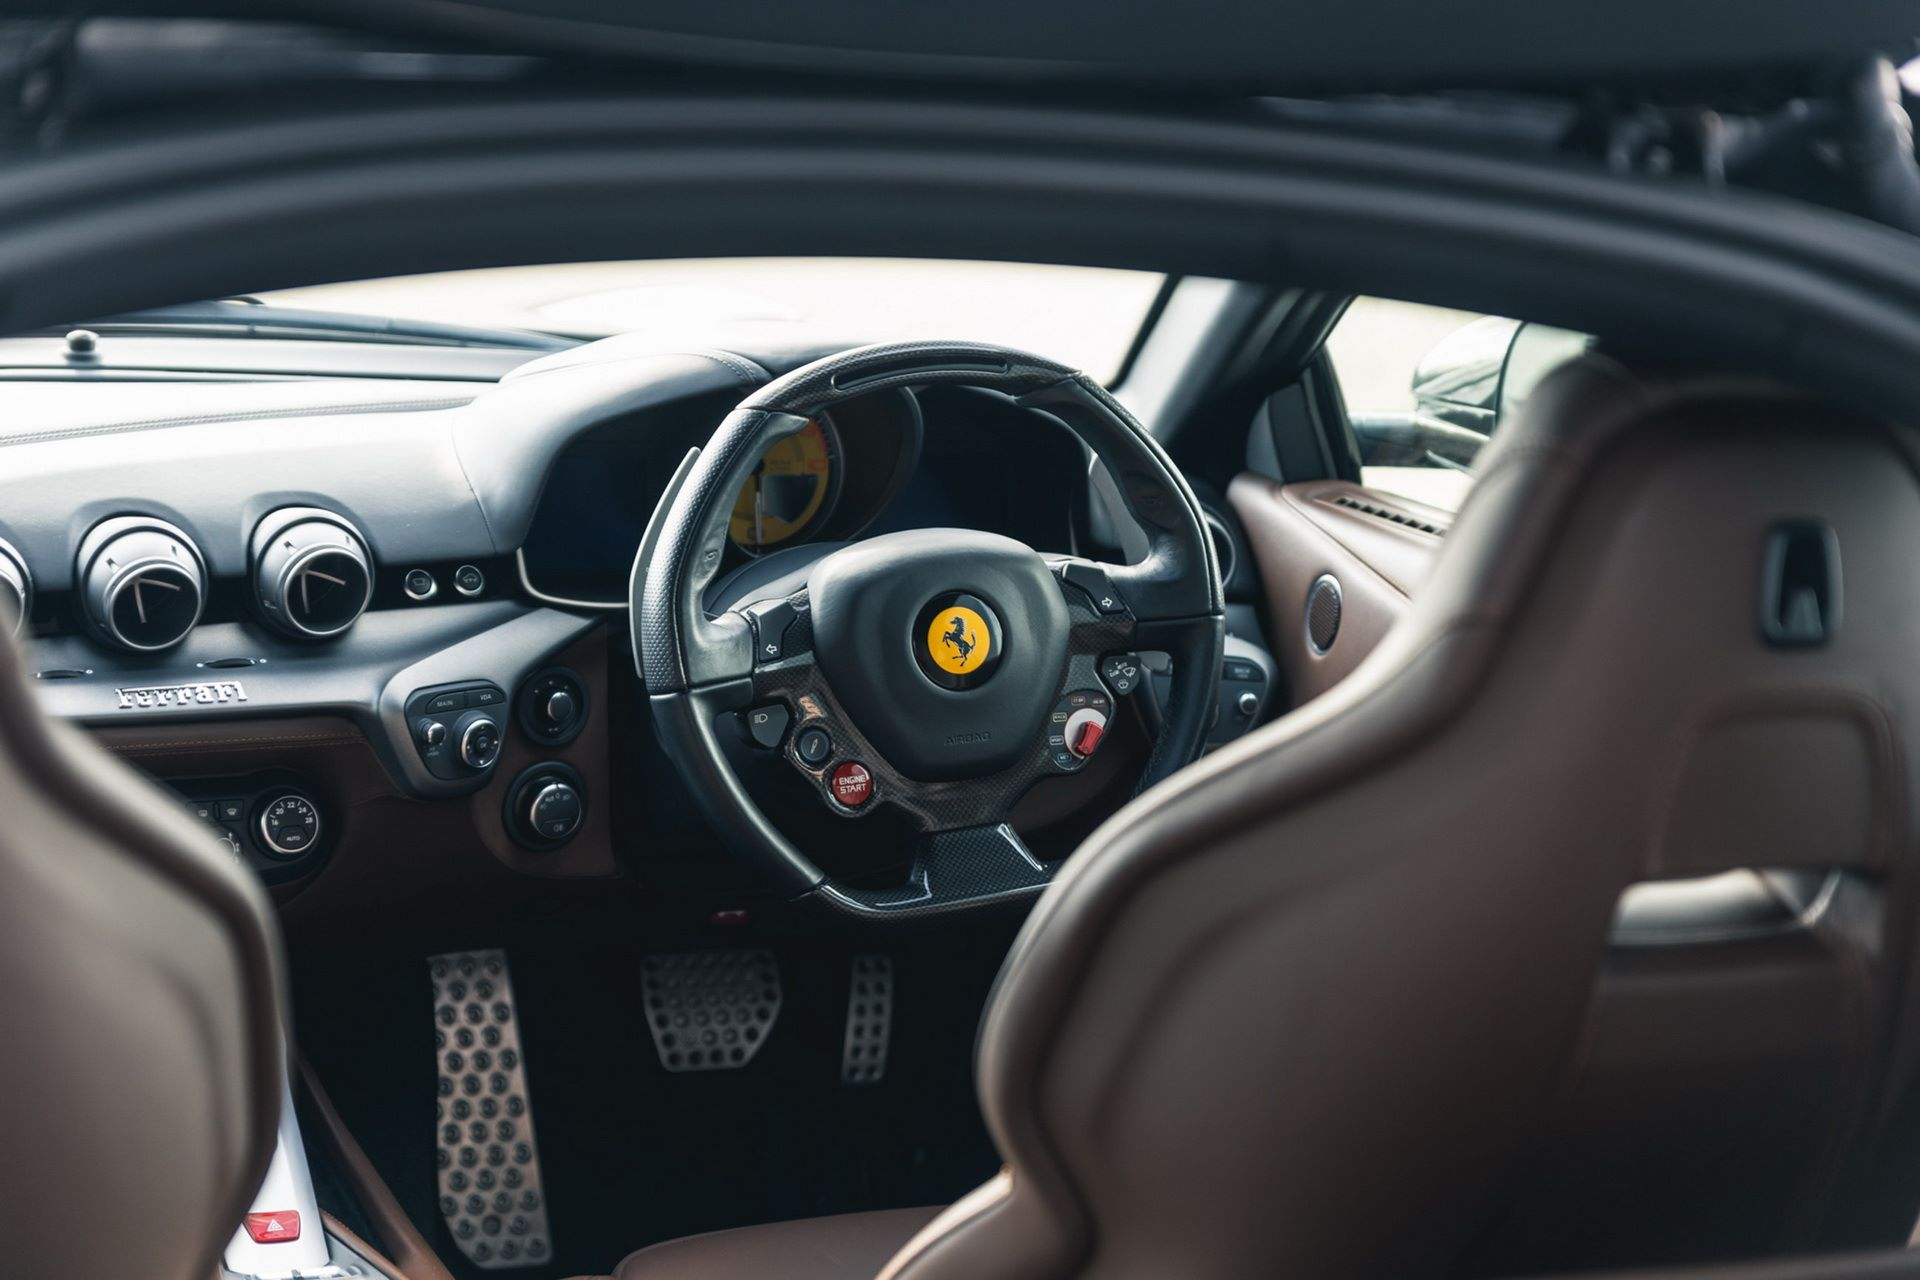 Ferrari-F12berlinetta-Chris-Harris-19